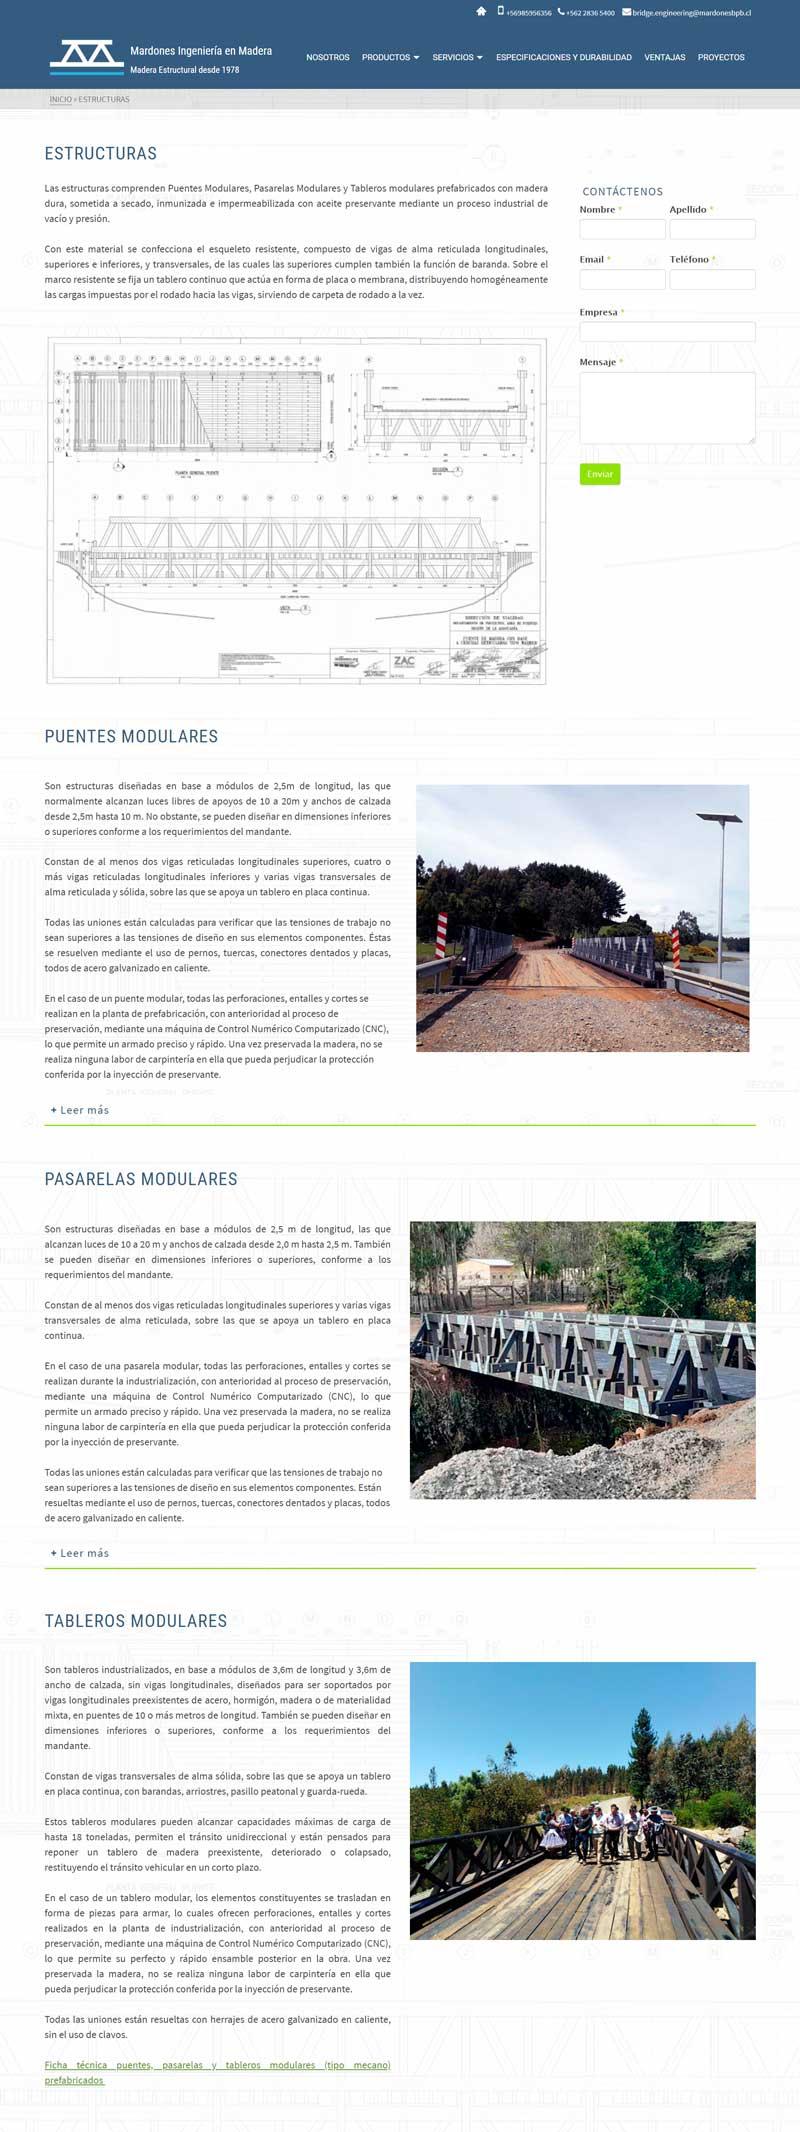 Neuroclick-portafolio-puentes-modulares-productos